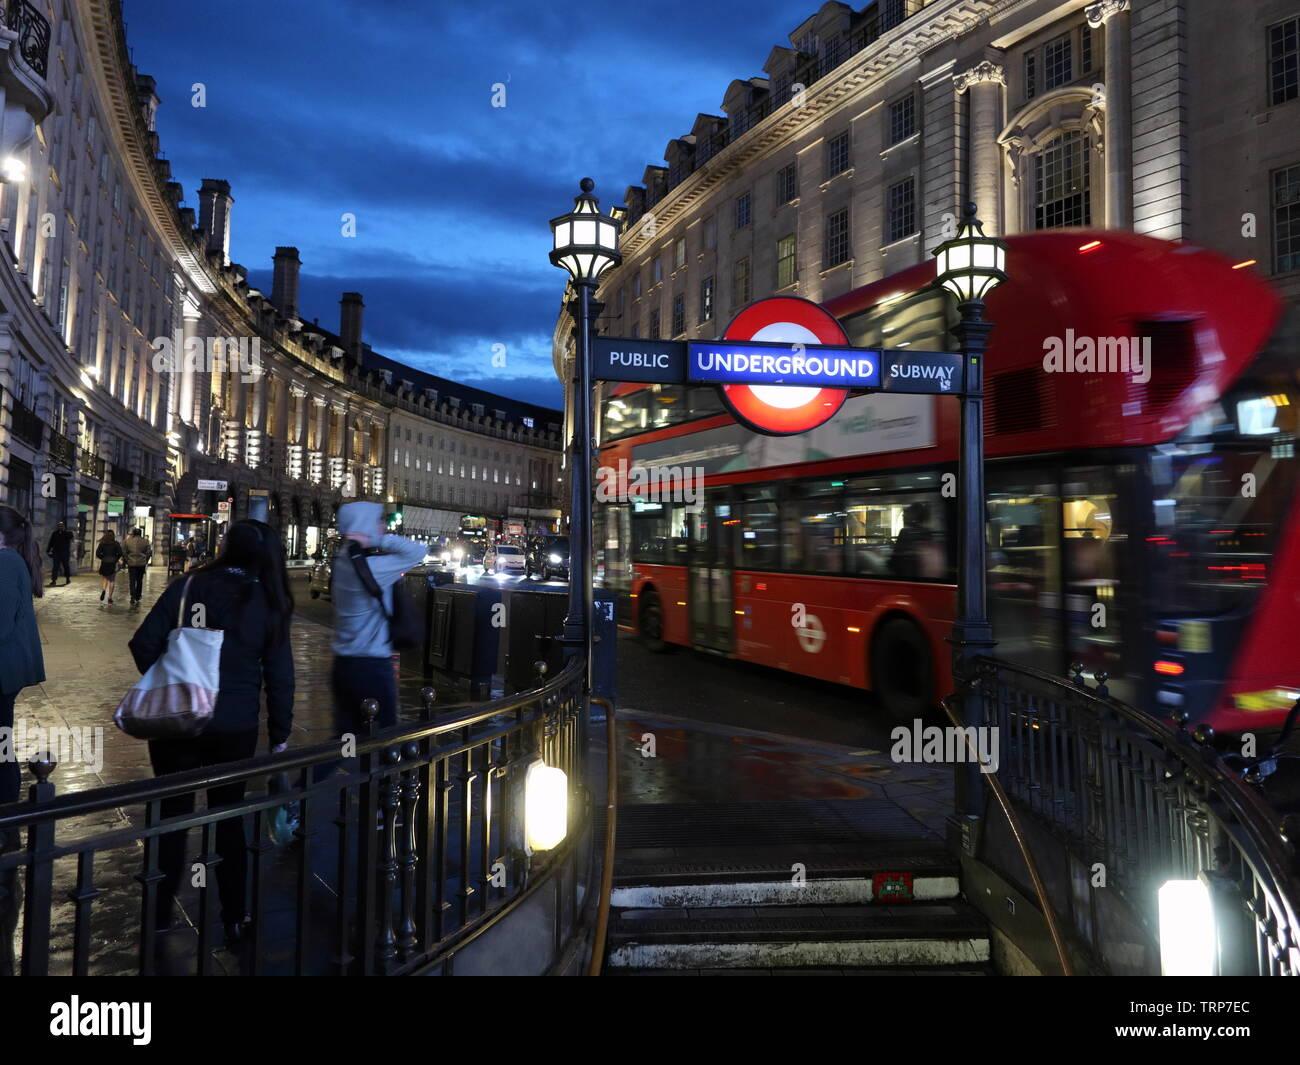 london-bus-passes-piccadilly-circus-station-entrance-on-regent-street-london-england-uk-TRP7EC.jpg